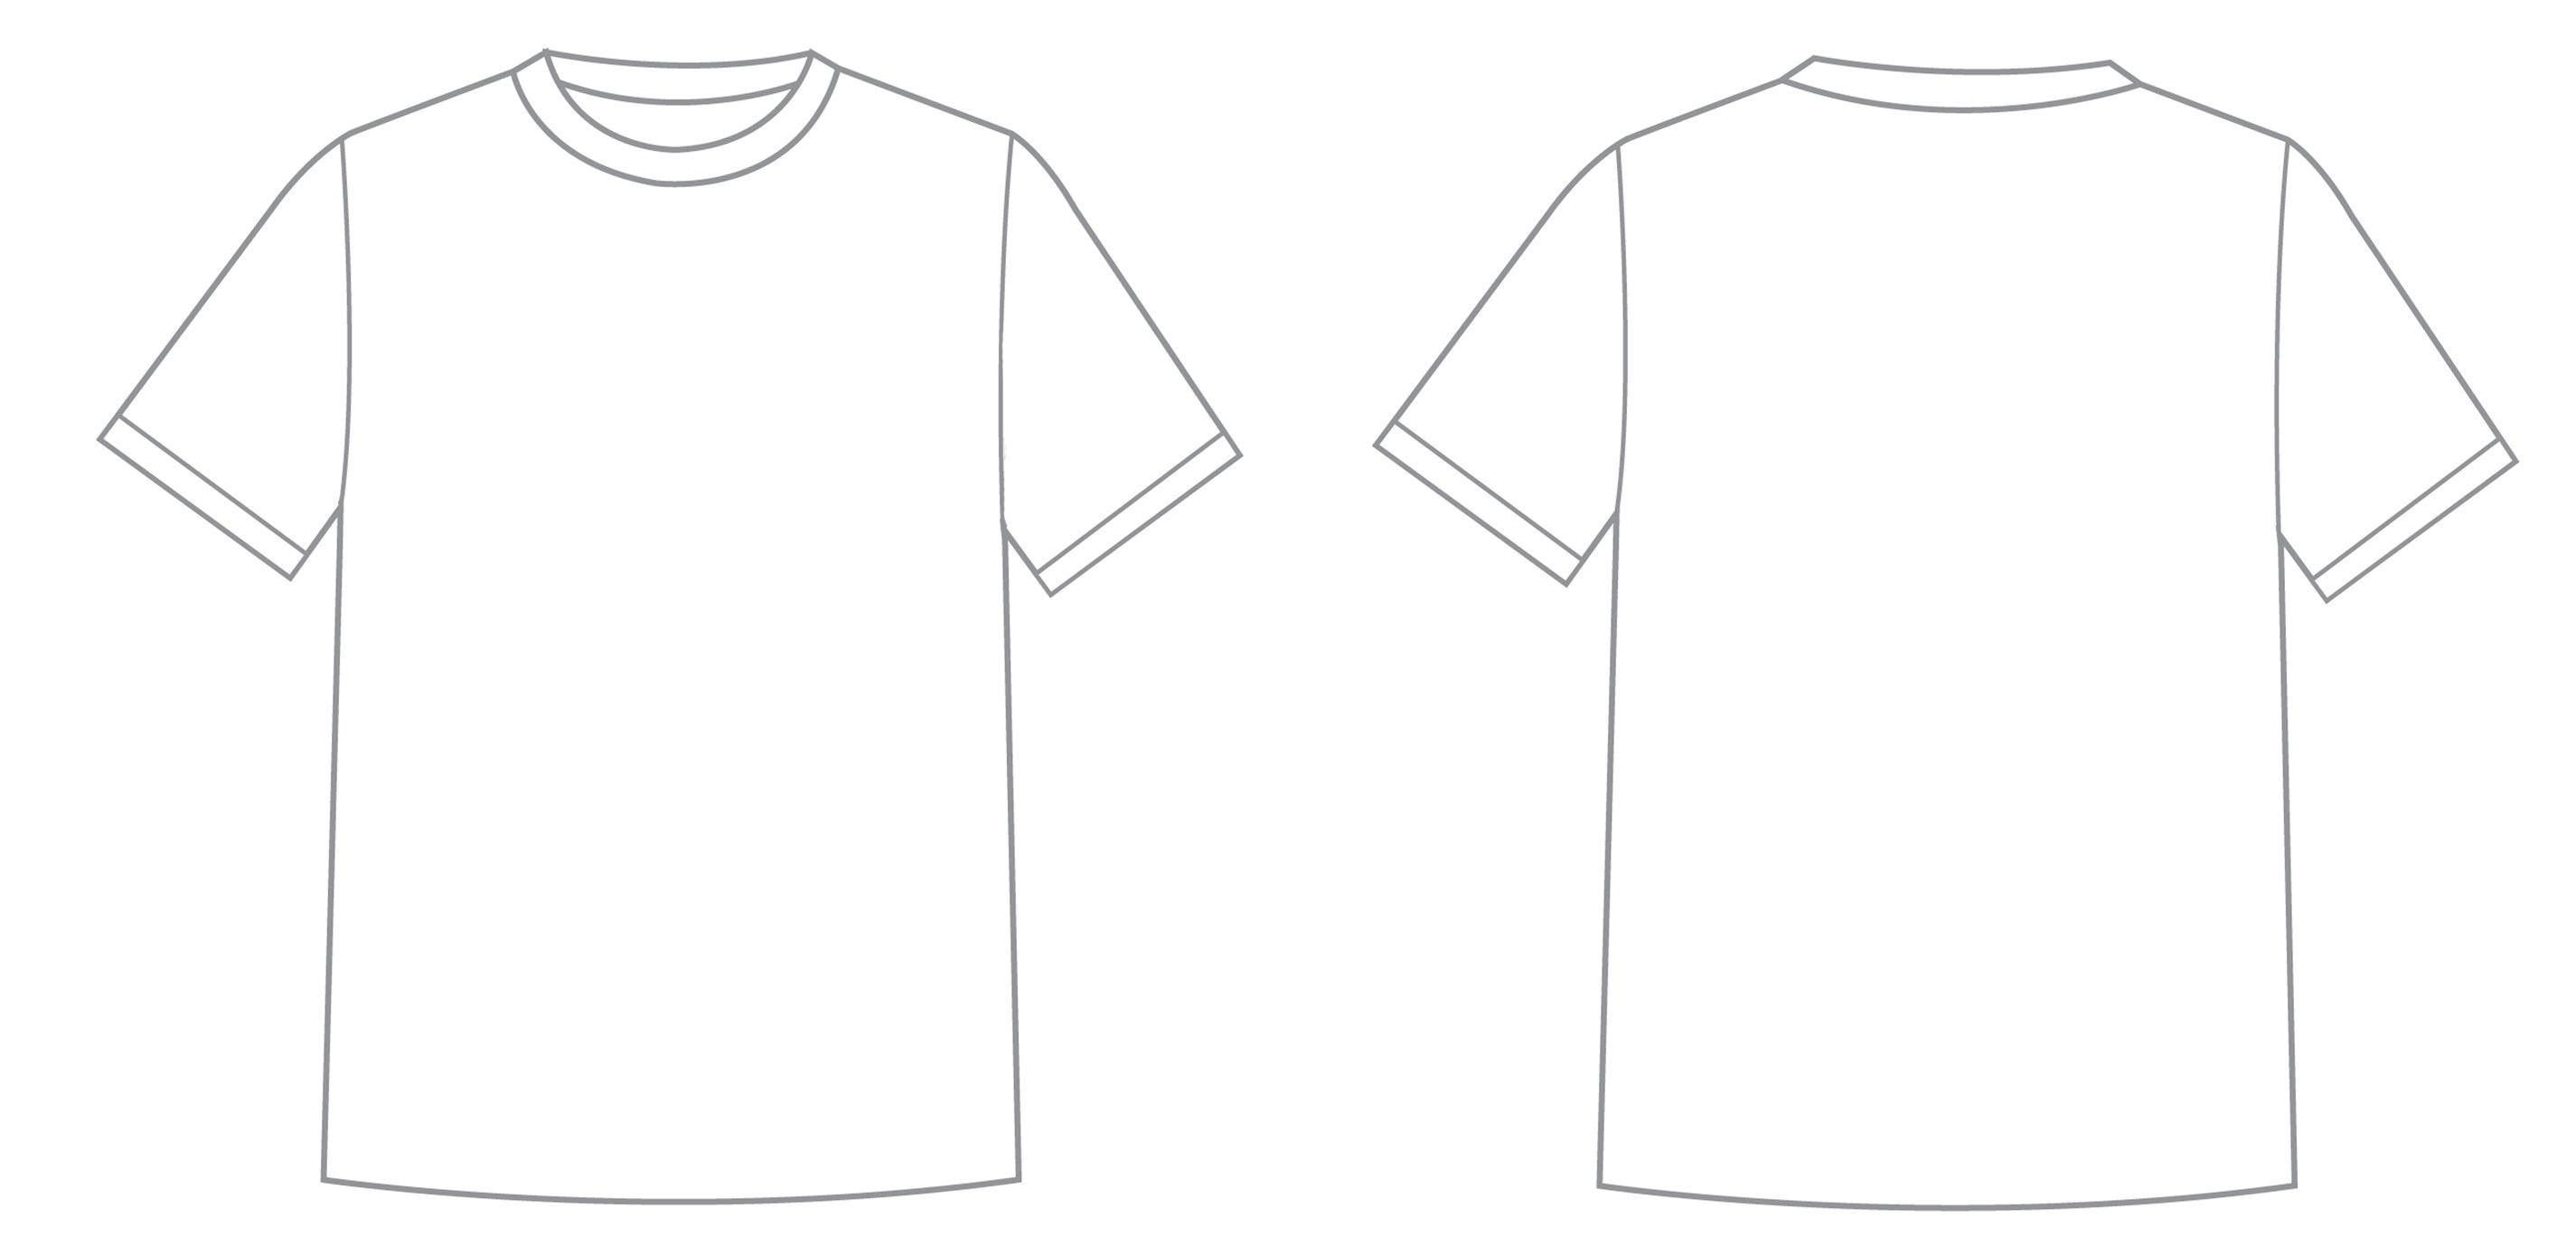 17 Printable T Shirt Template Portray Ideastocker T Shirt Design Template Shirt Template Clothing Templates